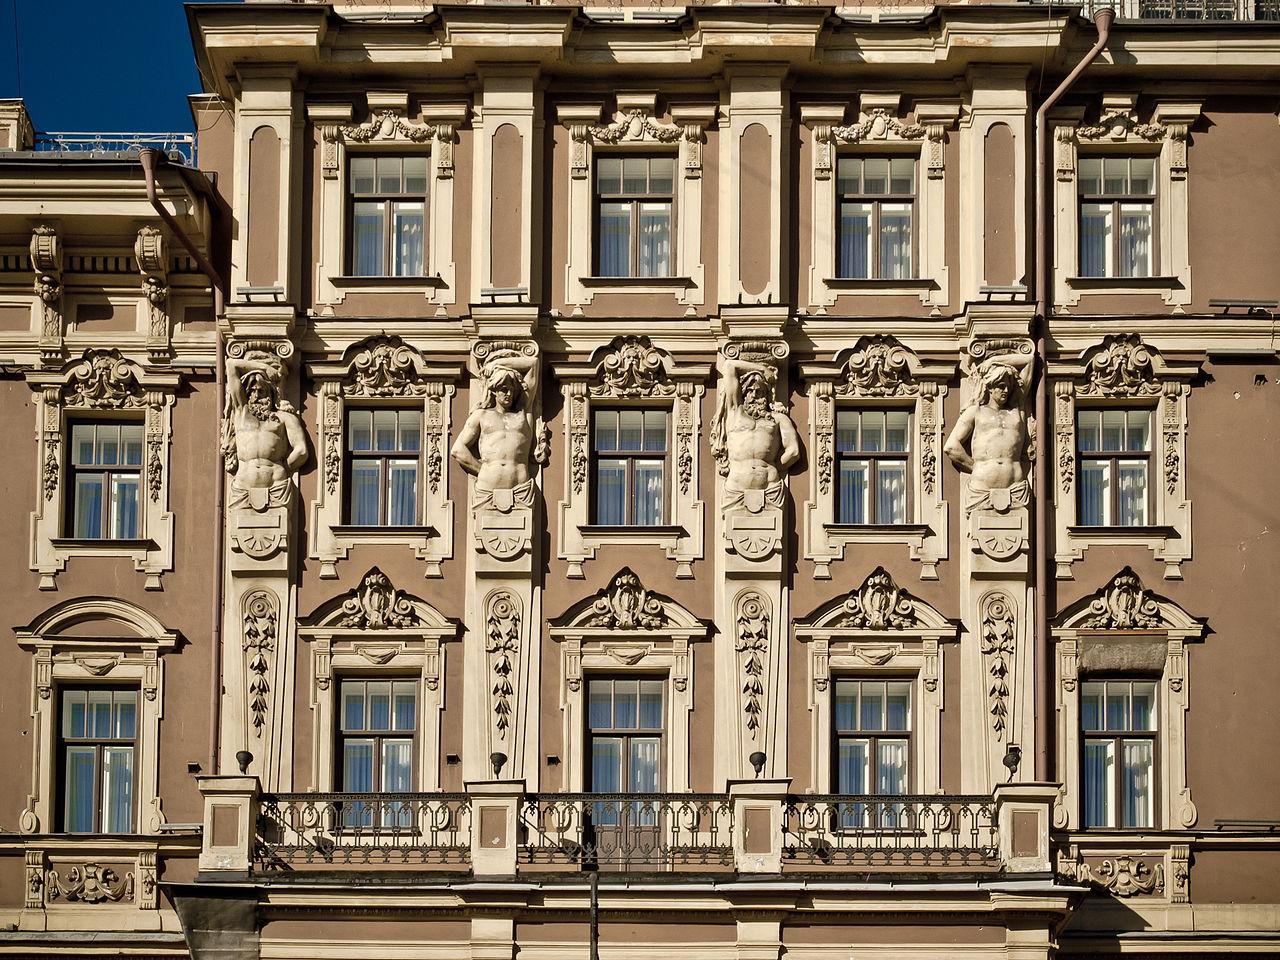 File:Grand Hotel Europe fragm.jpg